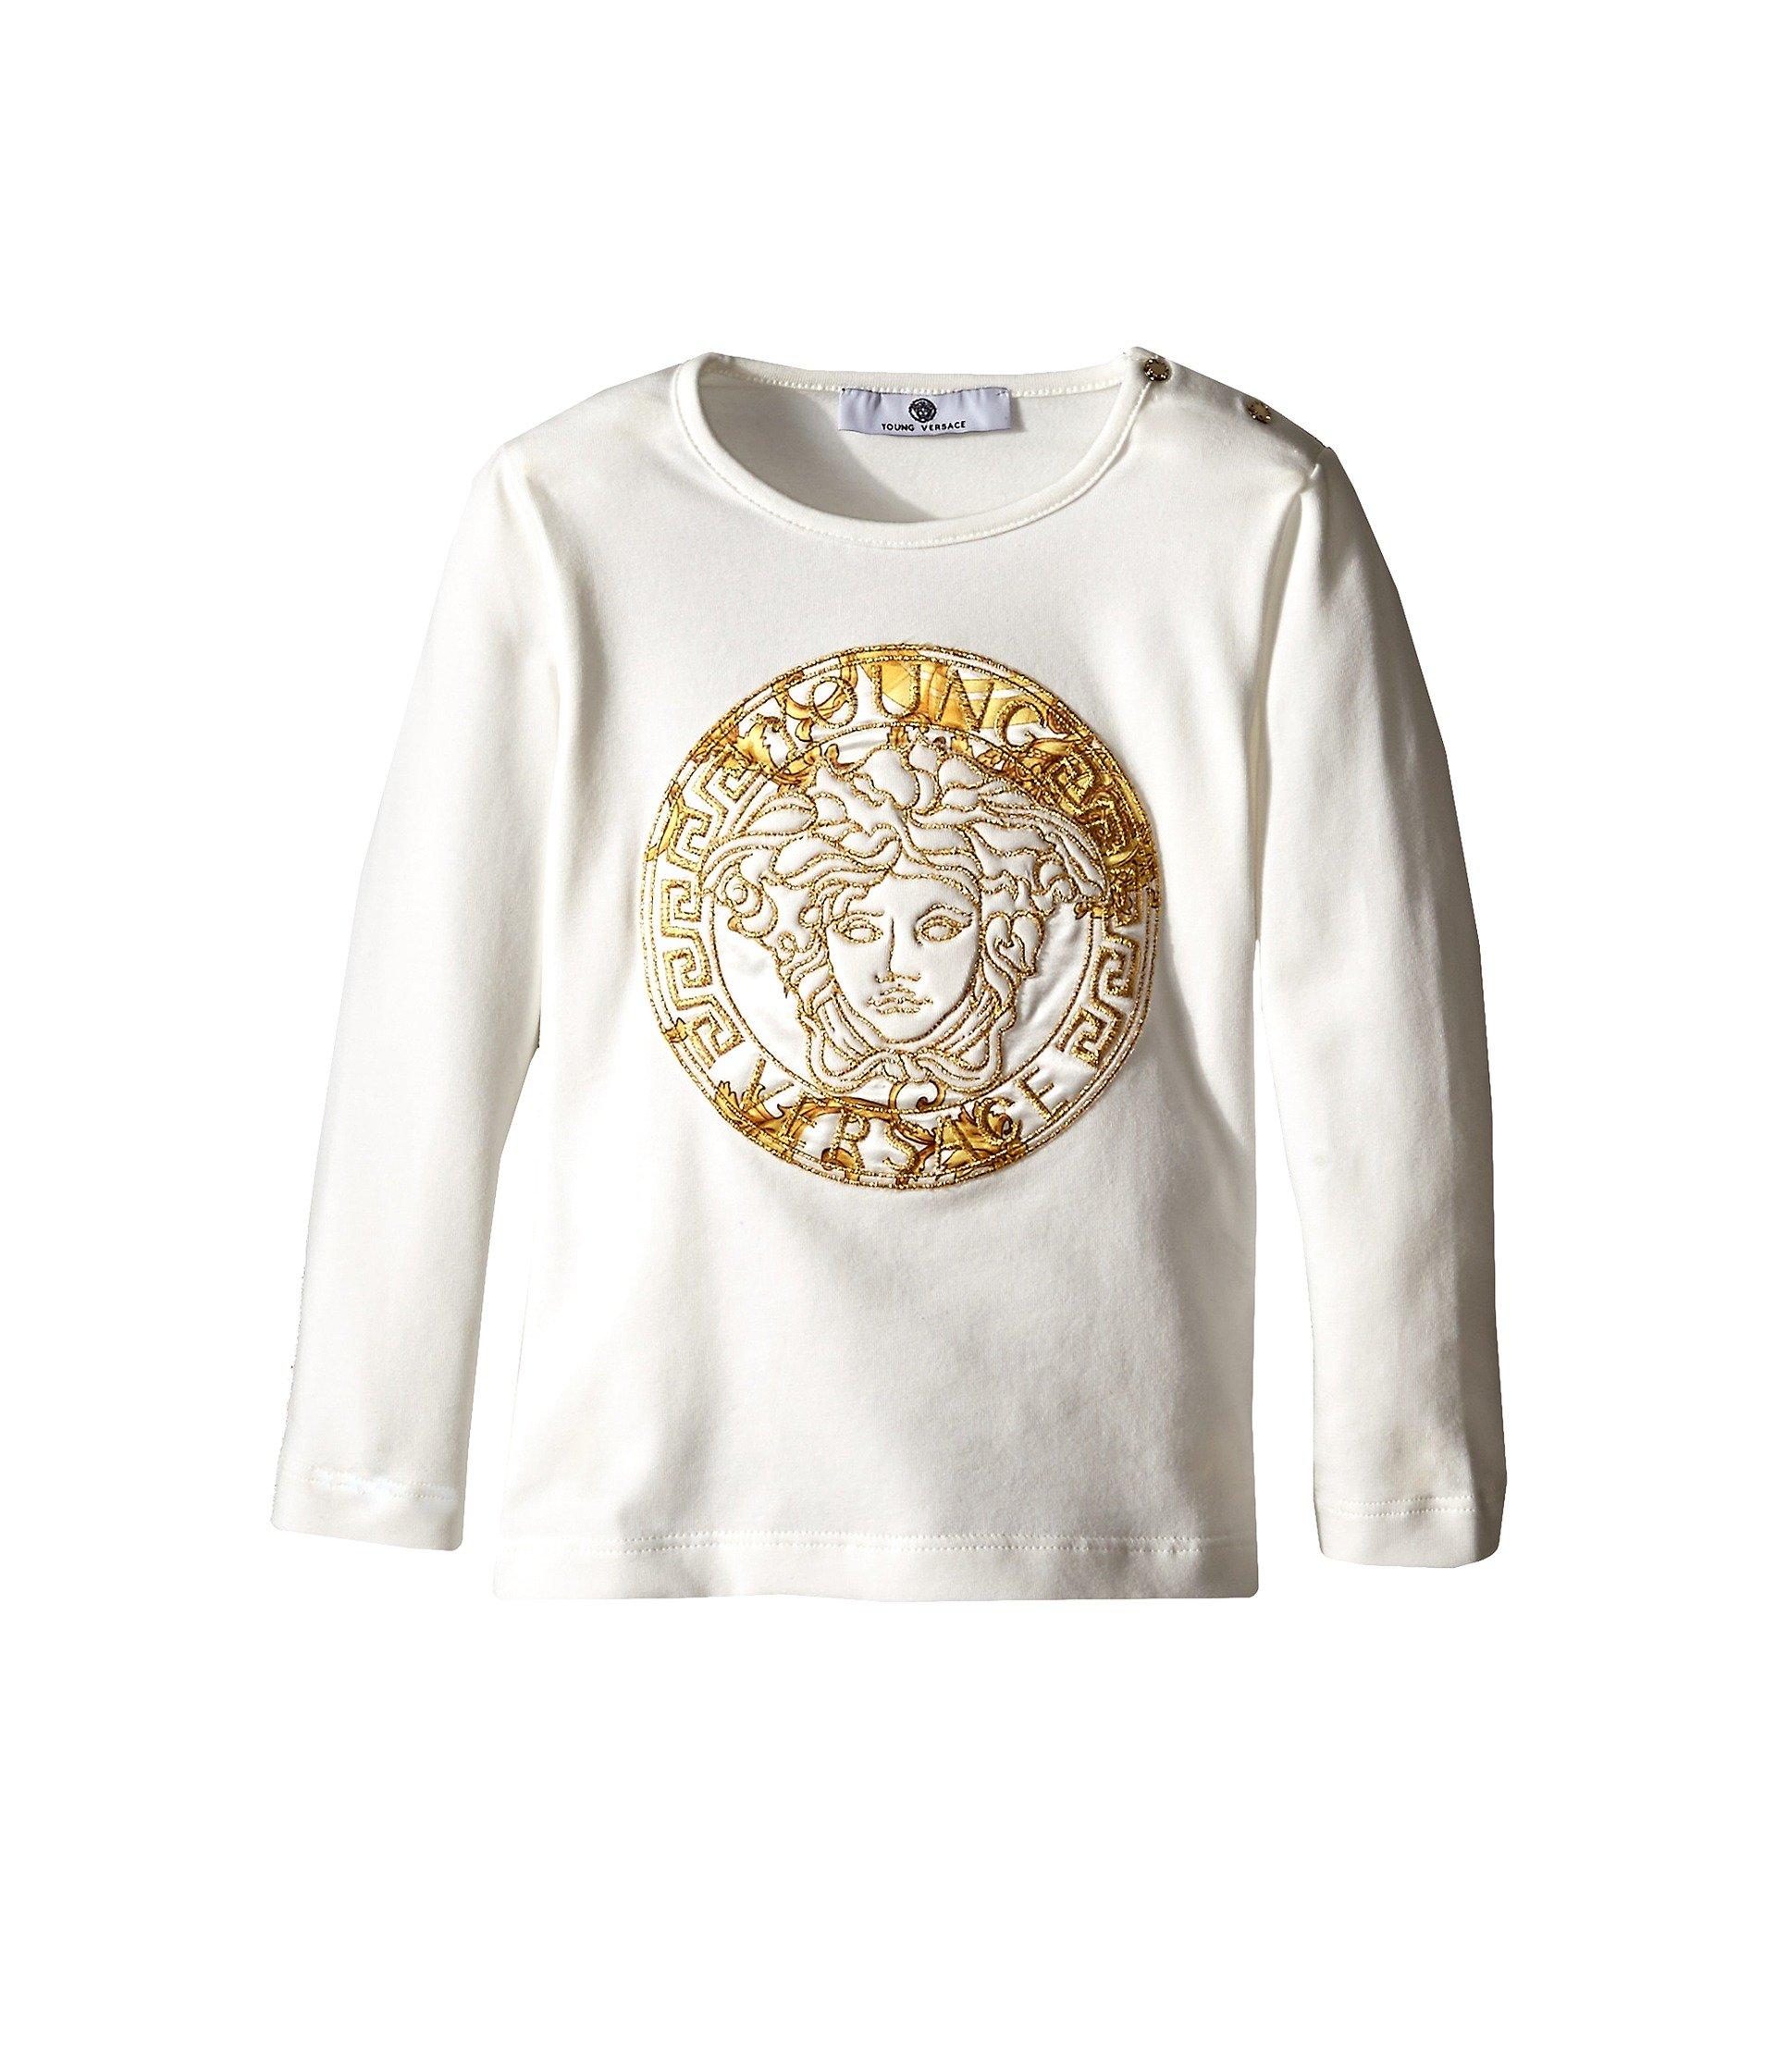 Camiseta para Niña Versace Kids Medusa Print w/ Stone Graphic Long Sleeve Tee  + Versace en VeoyCompro.net